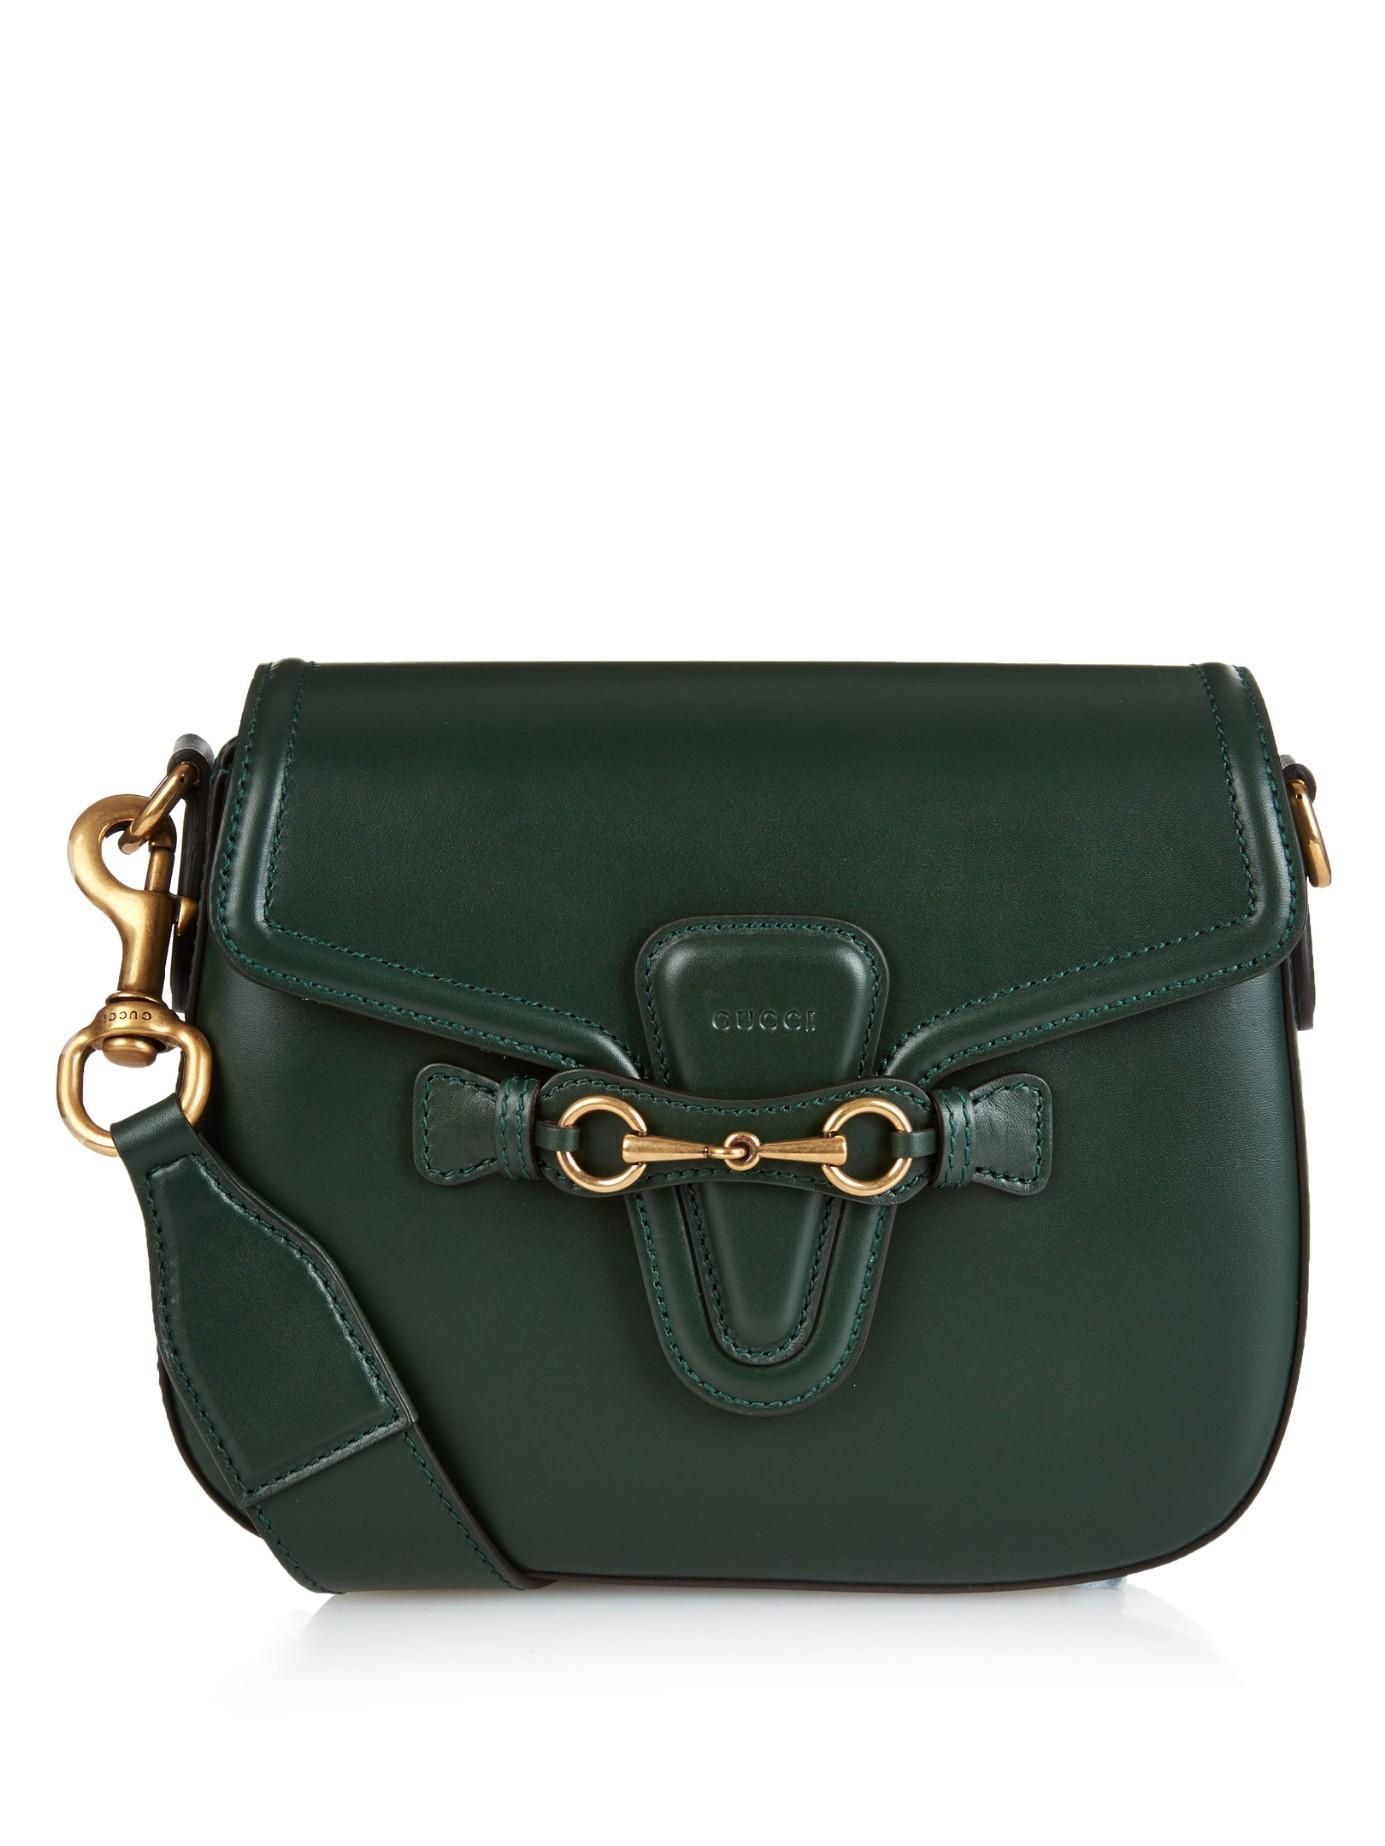 Lyst - Gucci Lady Web Medium Leather Cross-body Bag in Green 29e3b91cee